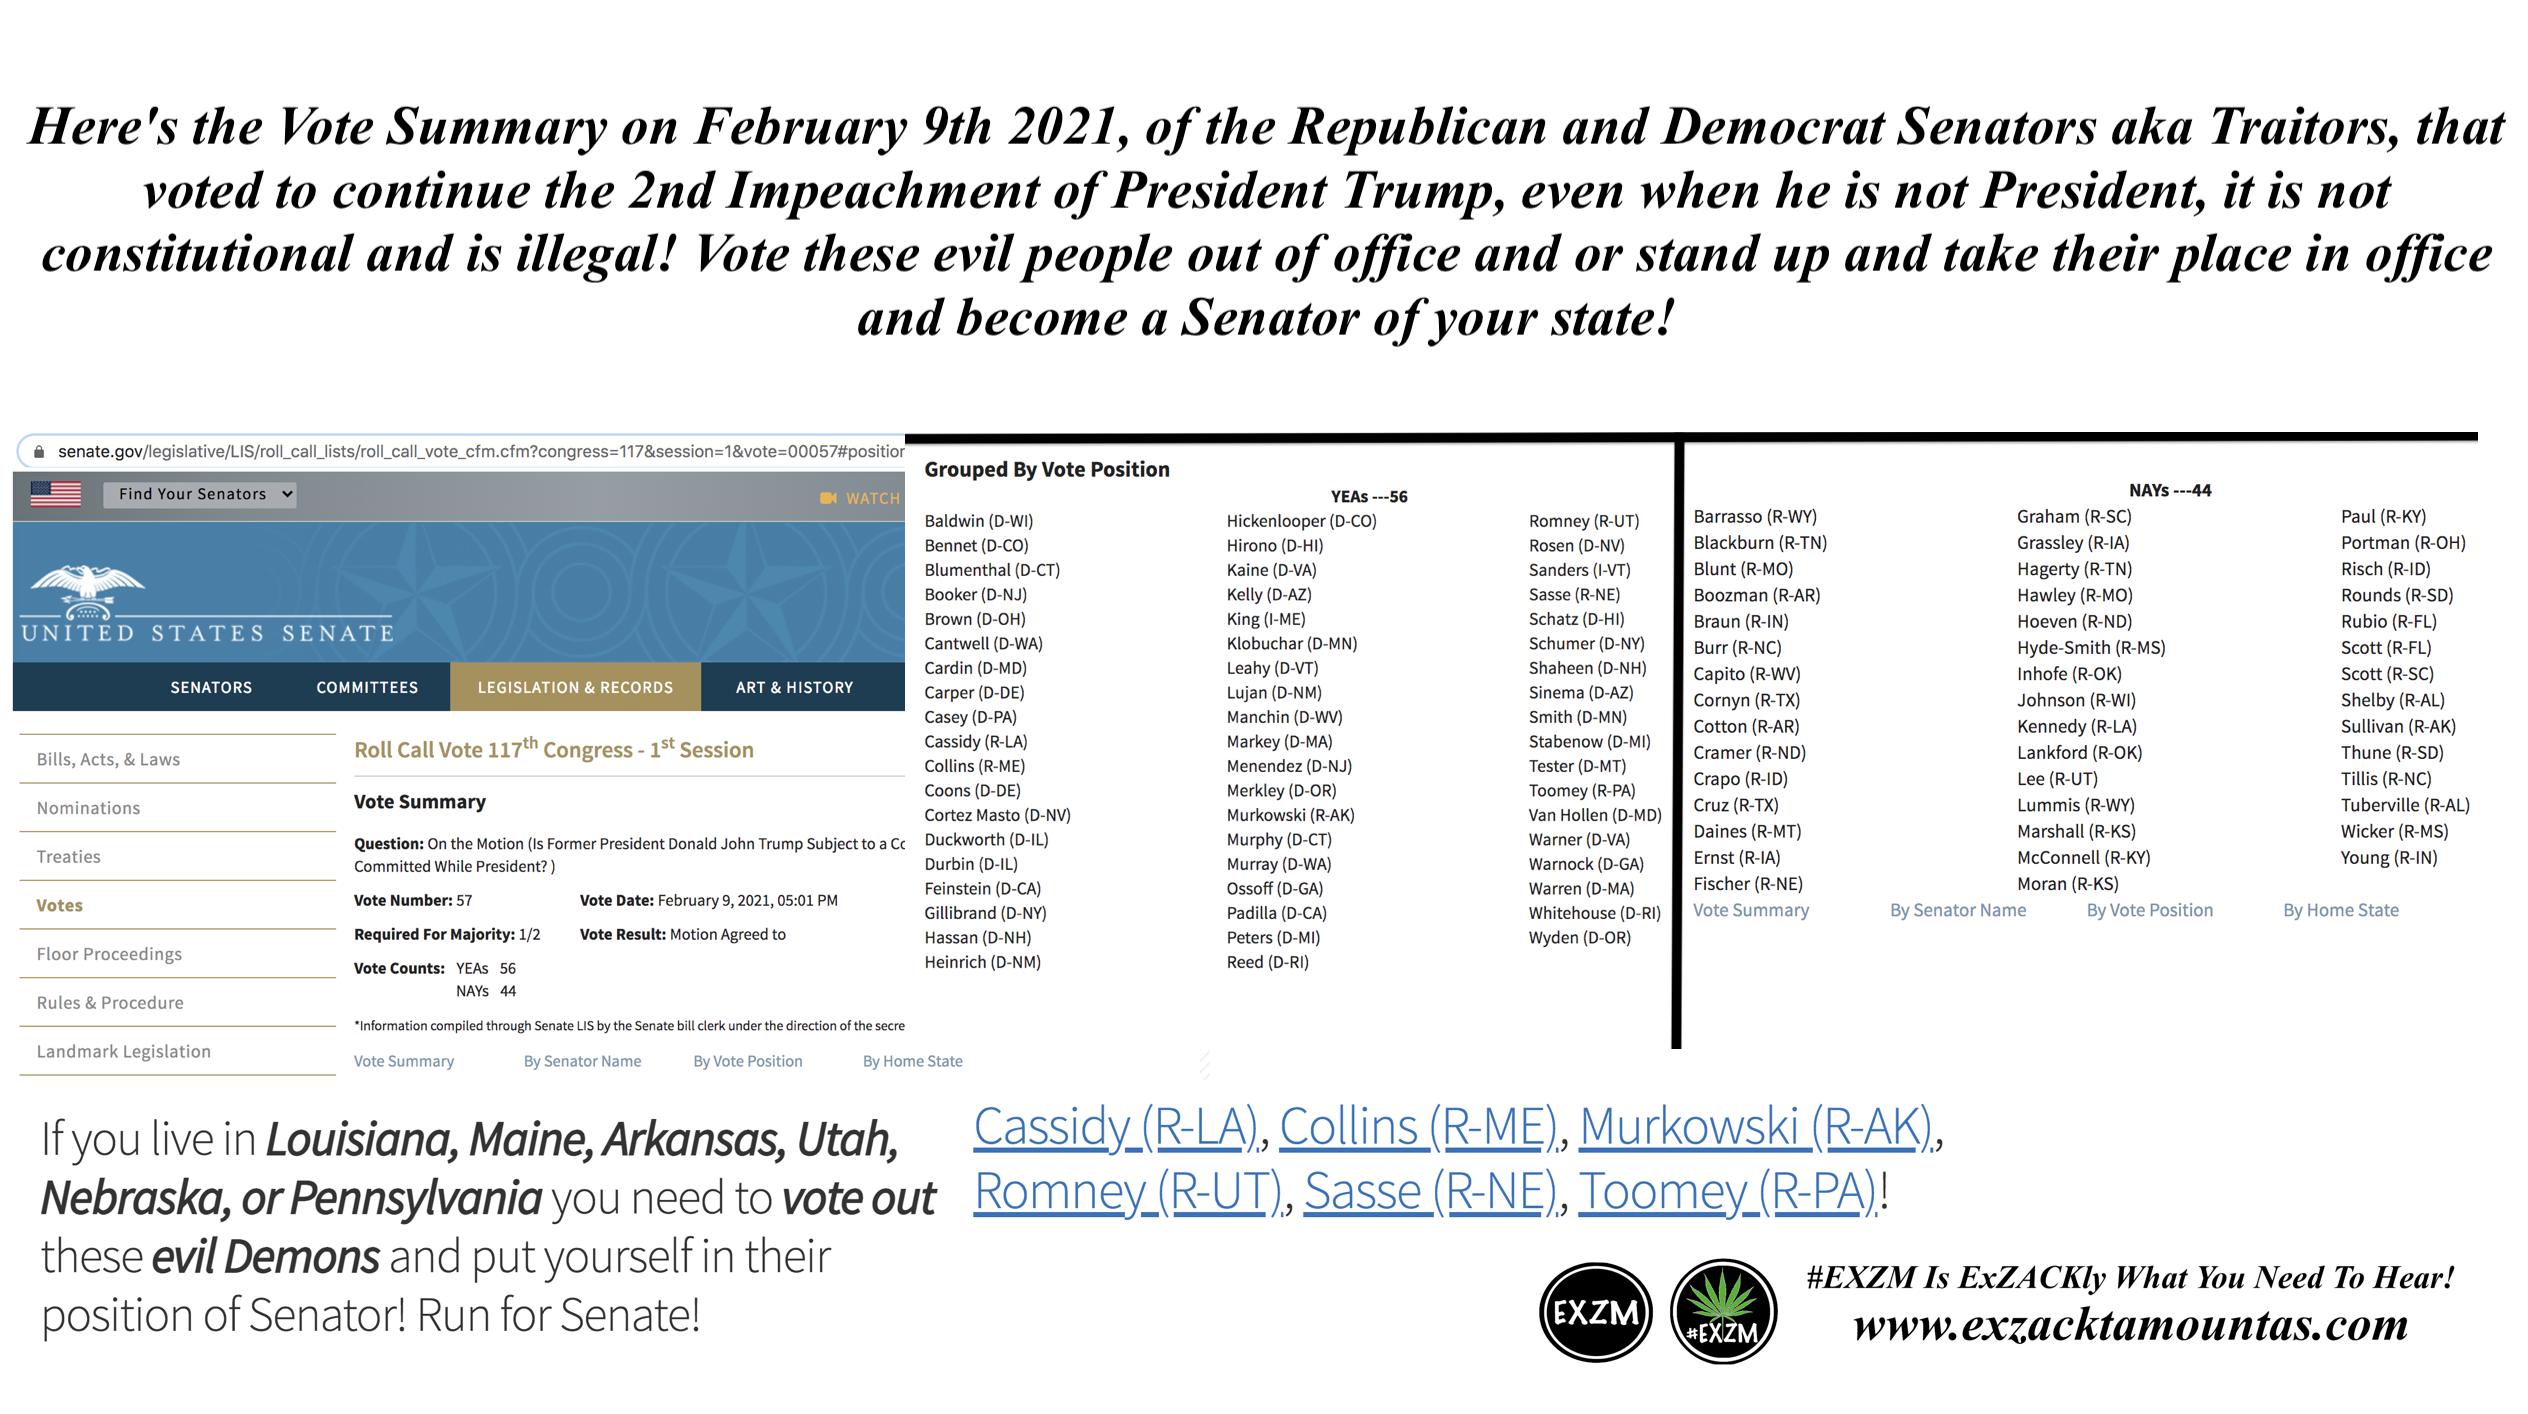 Republican Democrat Traitors voted to continue 2nd impechment President Donald Trump EXZM Zack Mount February 10th 2021